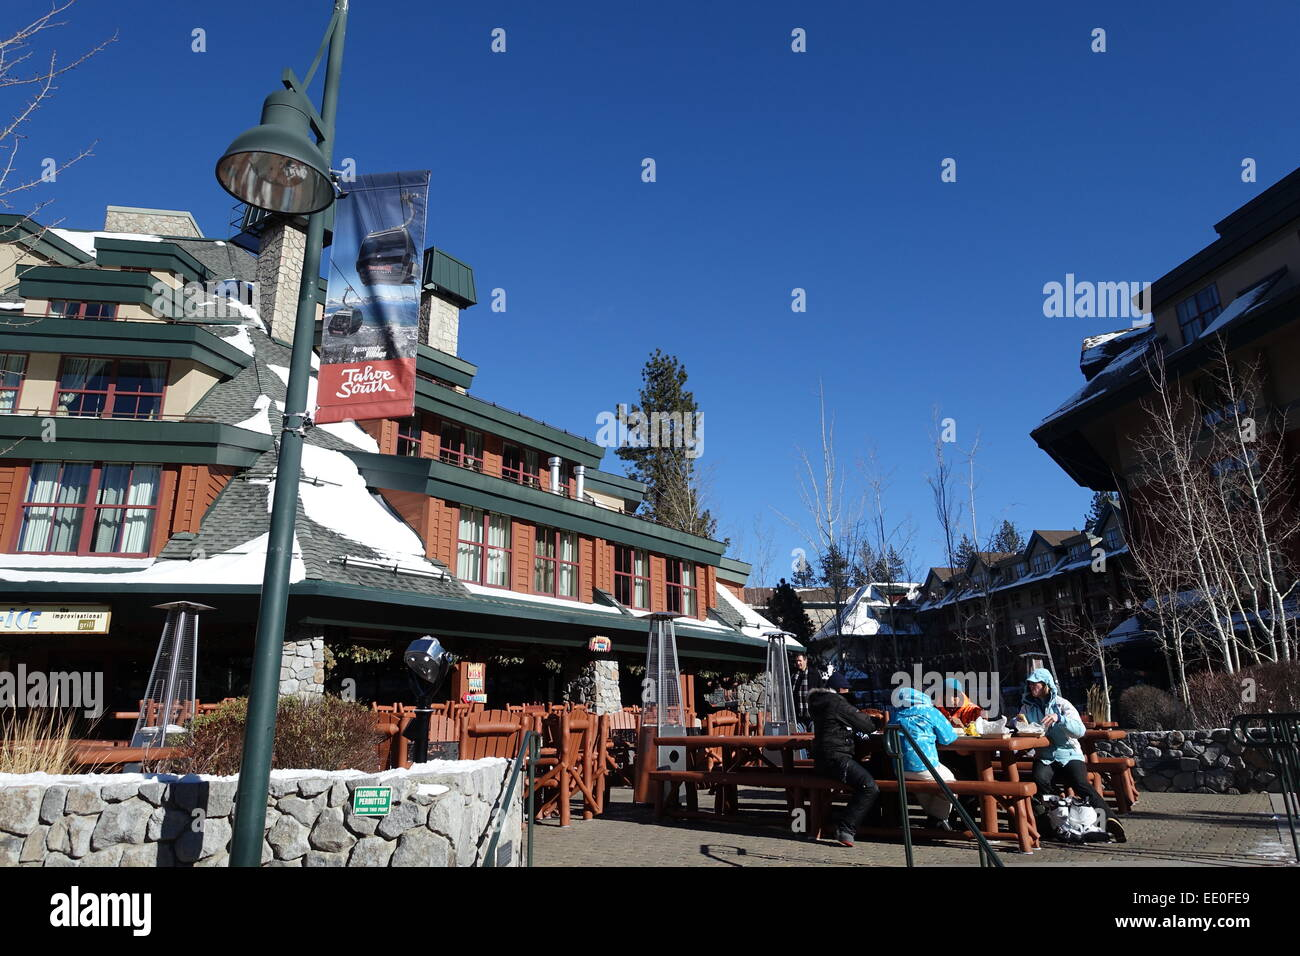 south tahoe ski resort stock photos & south tahoe ski resort stock